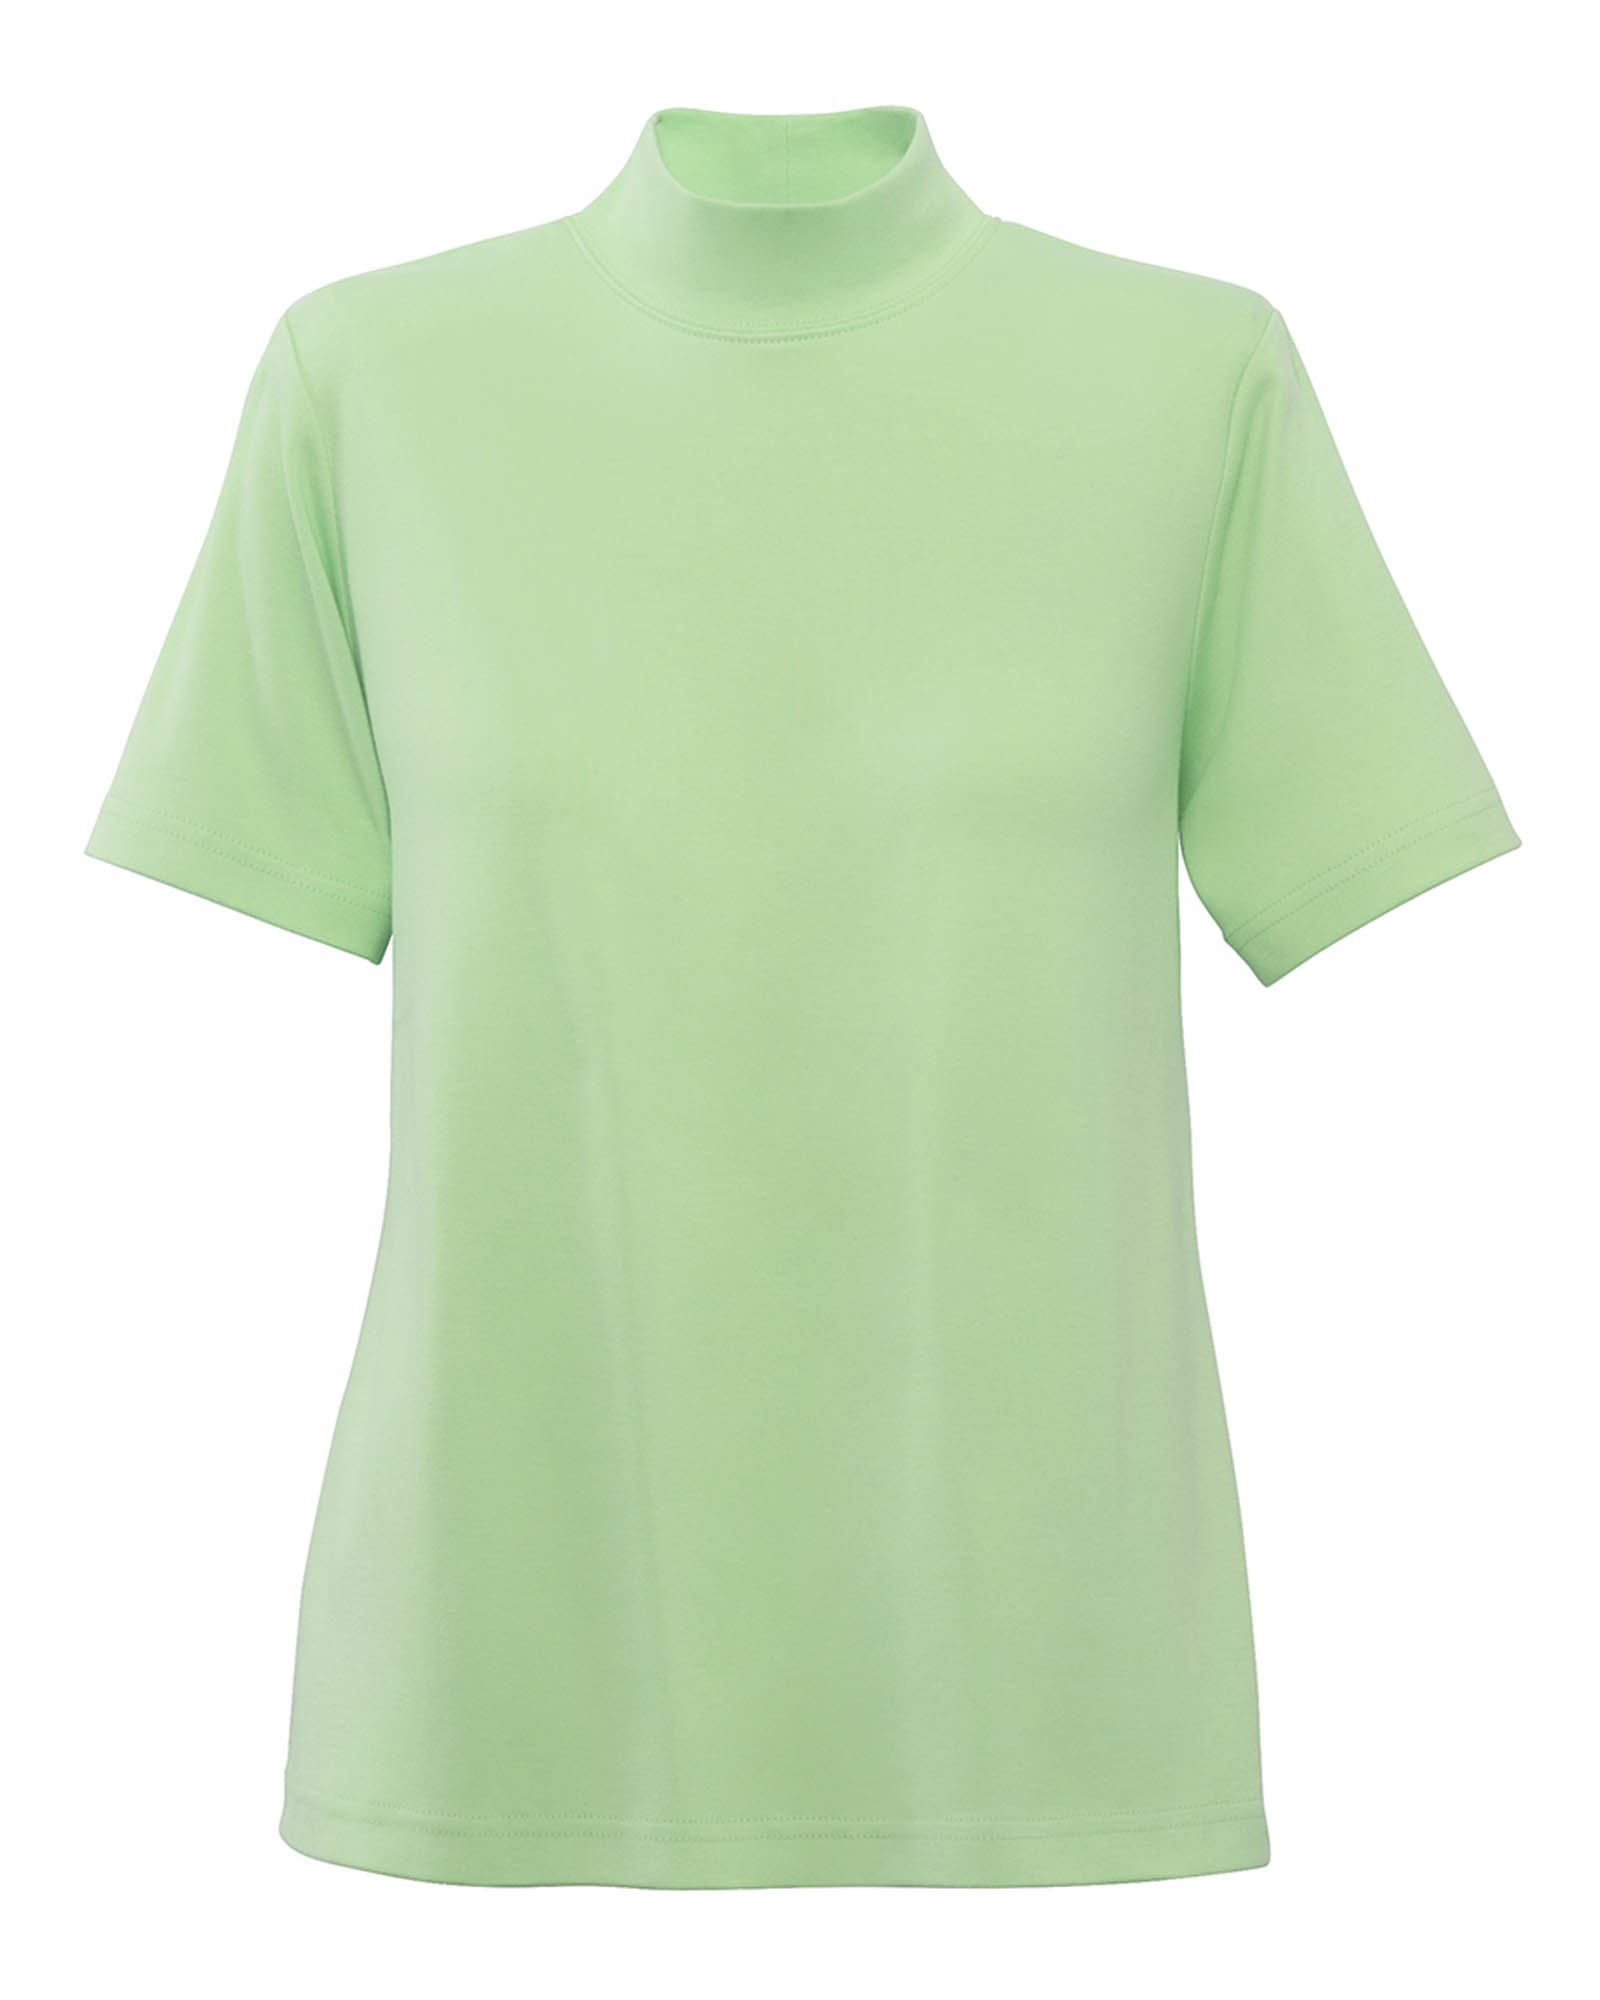 UltraSofts Cotton-Polyester Mock Top, Pistachio, Medium